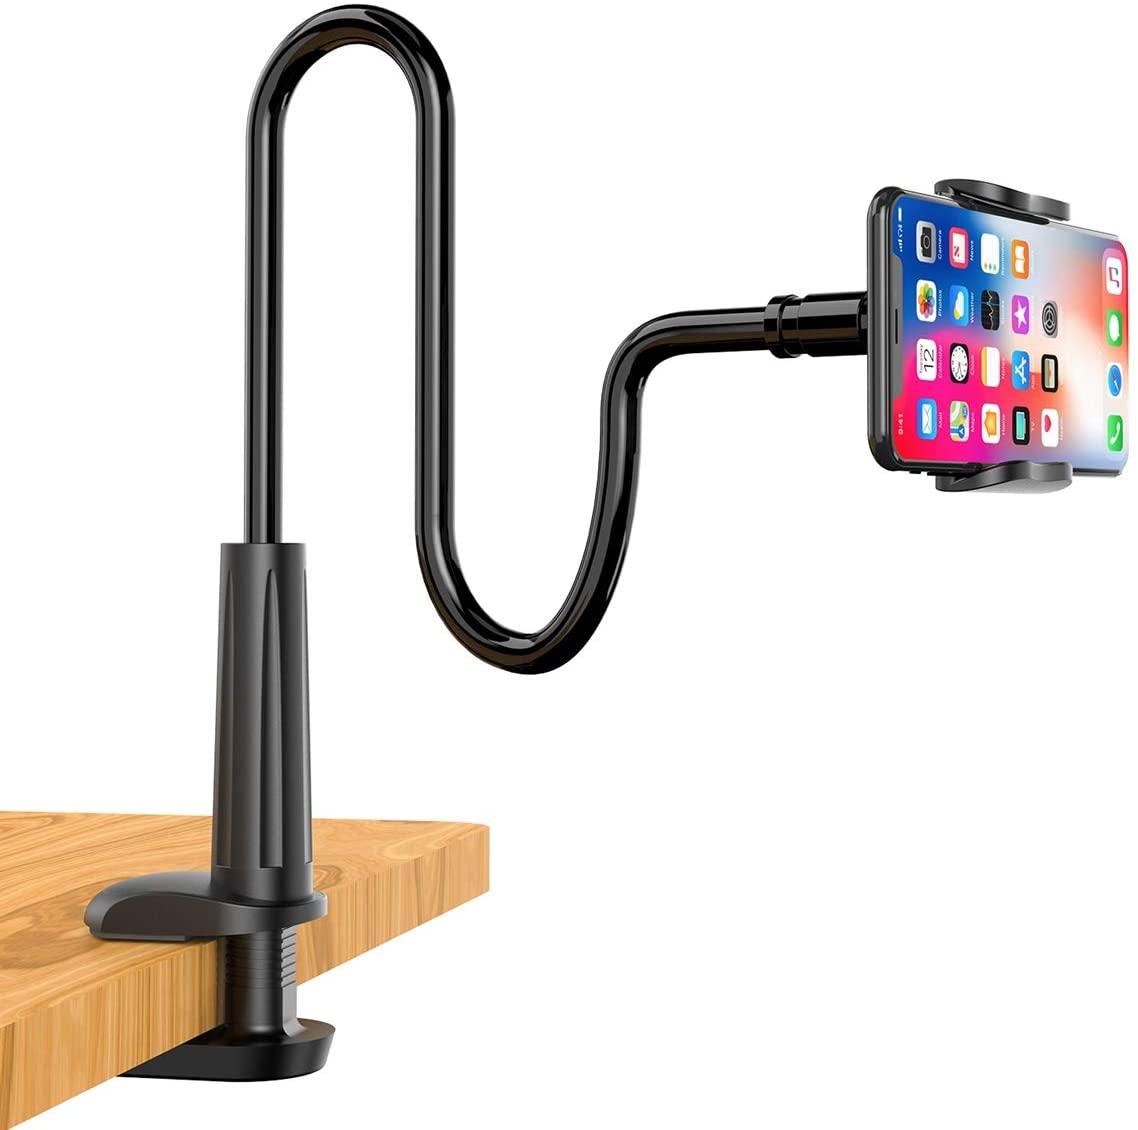 Universal Flexible Gooseneck Smartphone Tablet Mount $9.99 (reg $30)